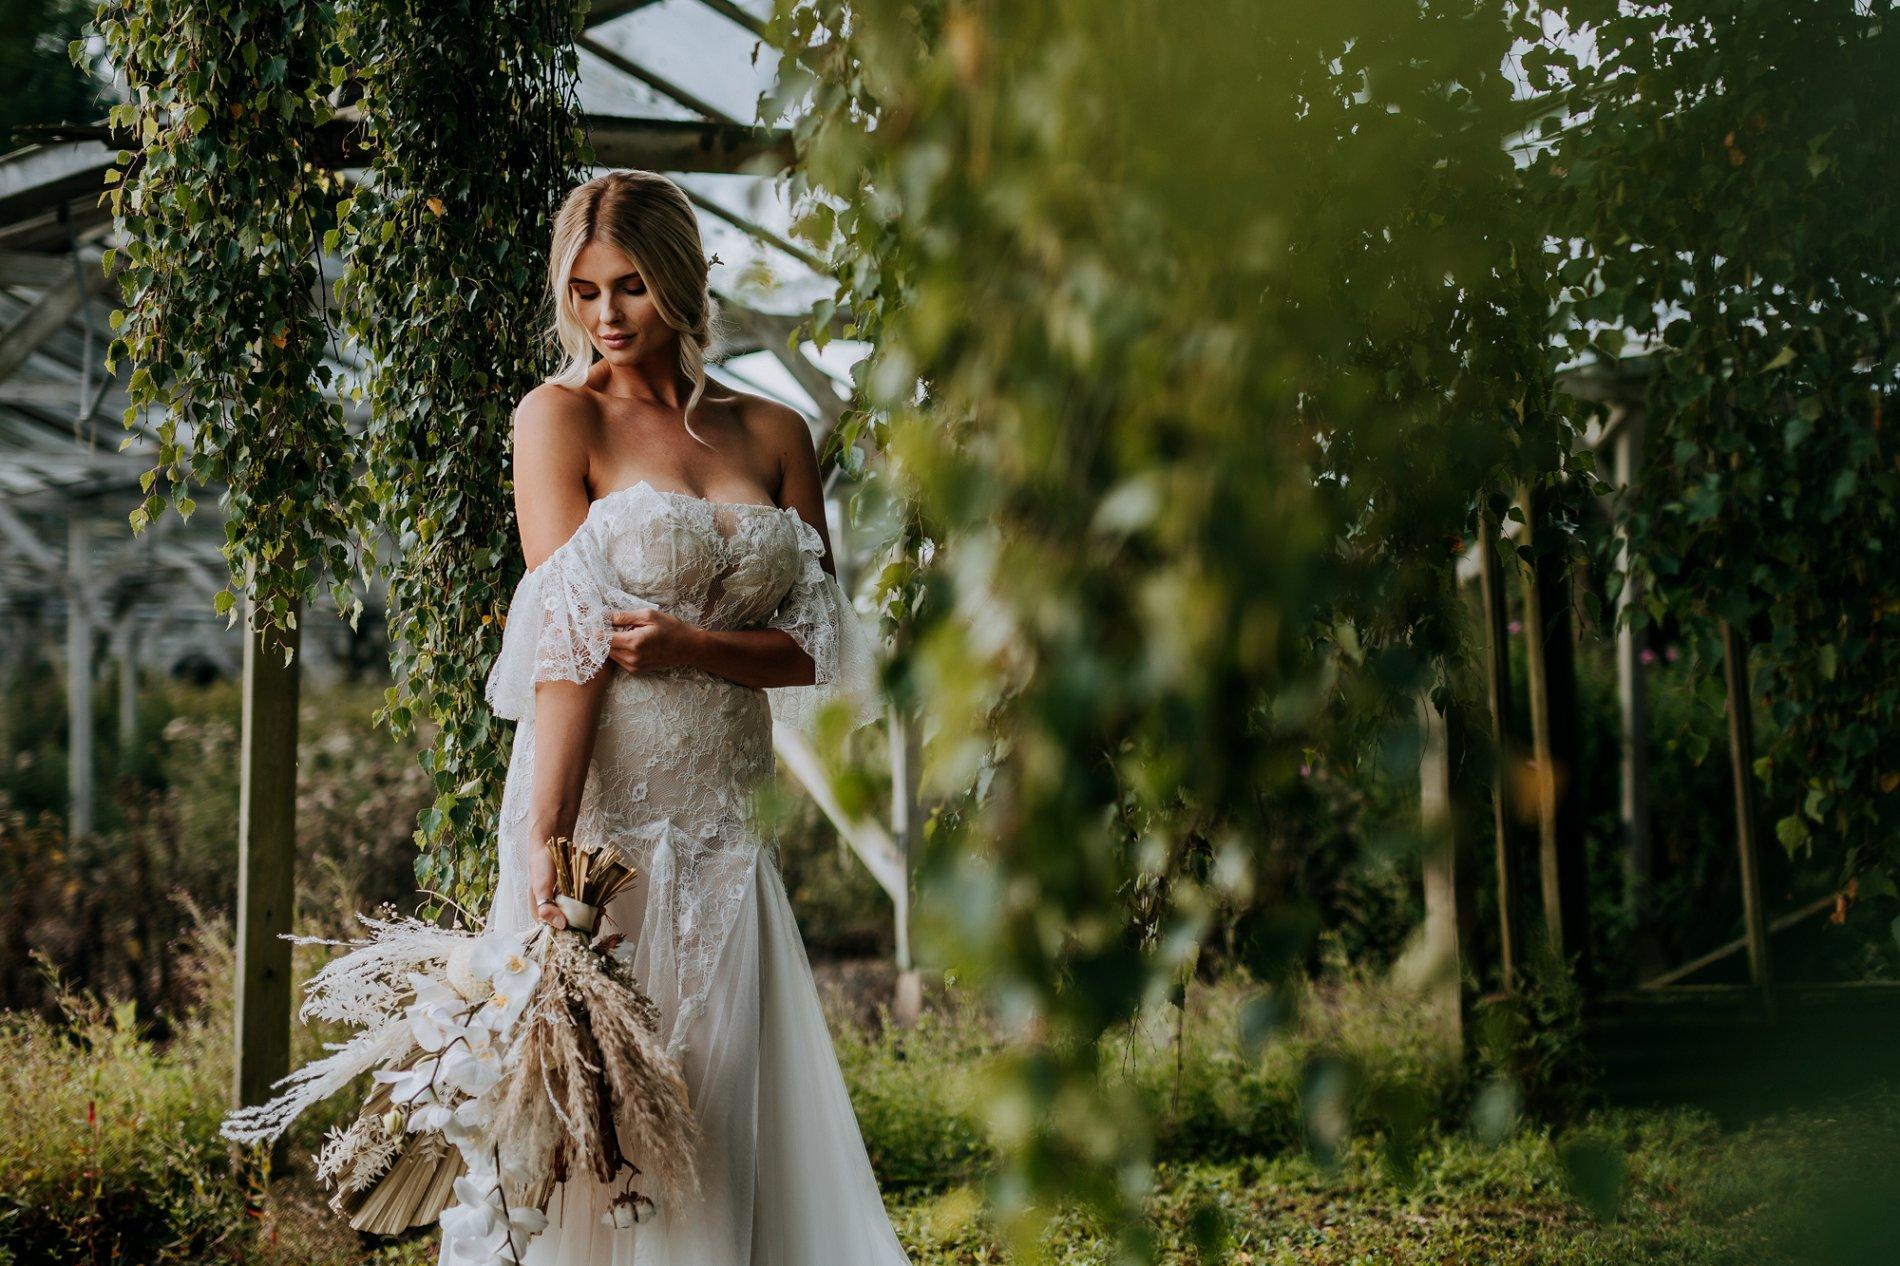 A Creative Elizabeth Lucas Bridal Fashion Editorial in Yorkshire (c) M and G Wedding Photography (10)